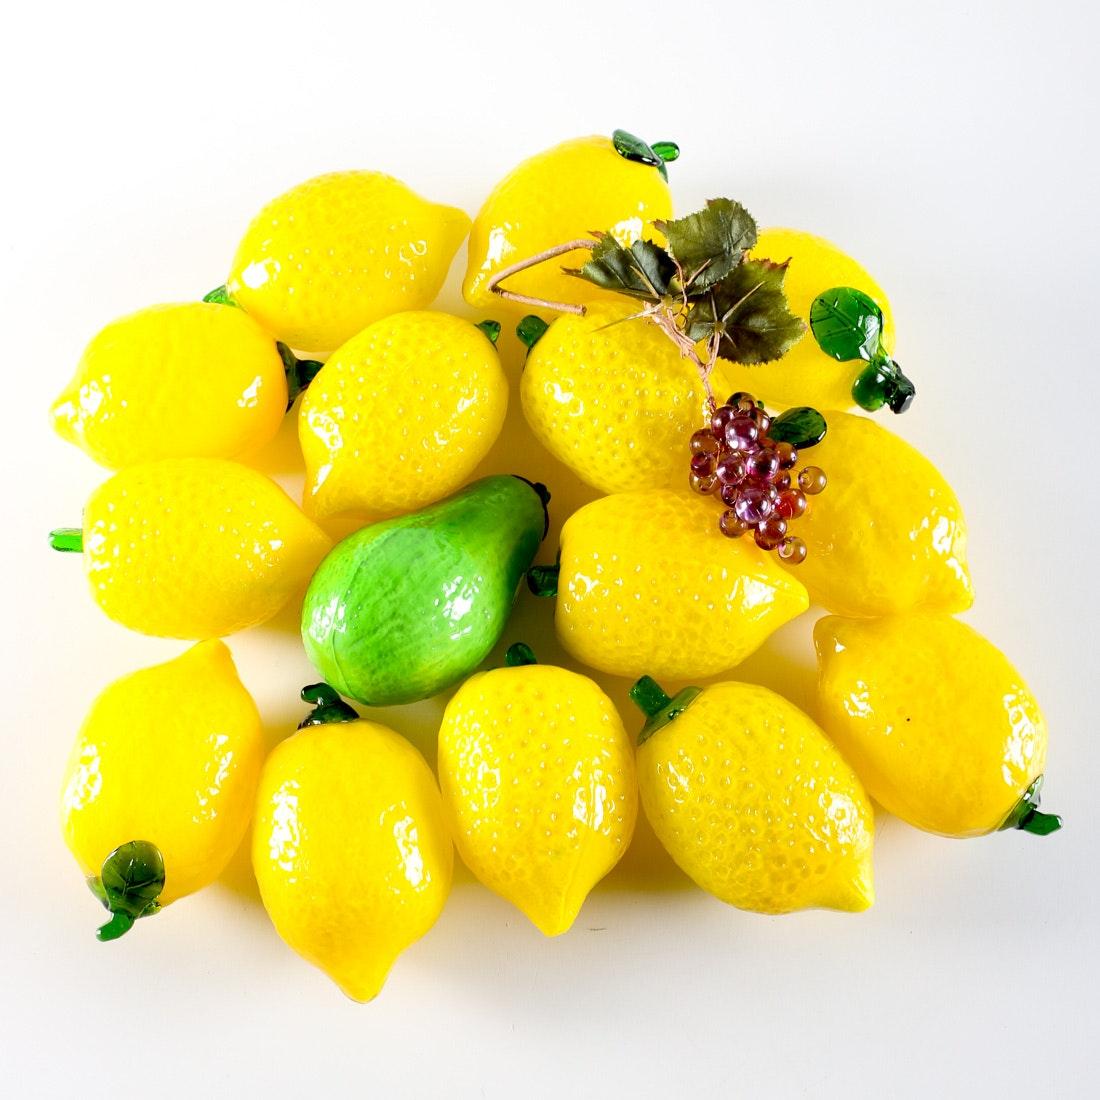 Glass Lemons and Other Fruit